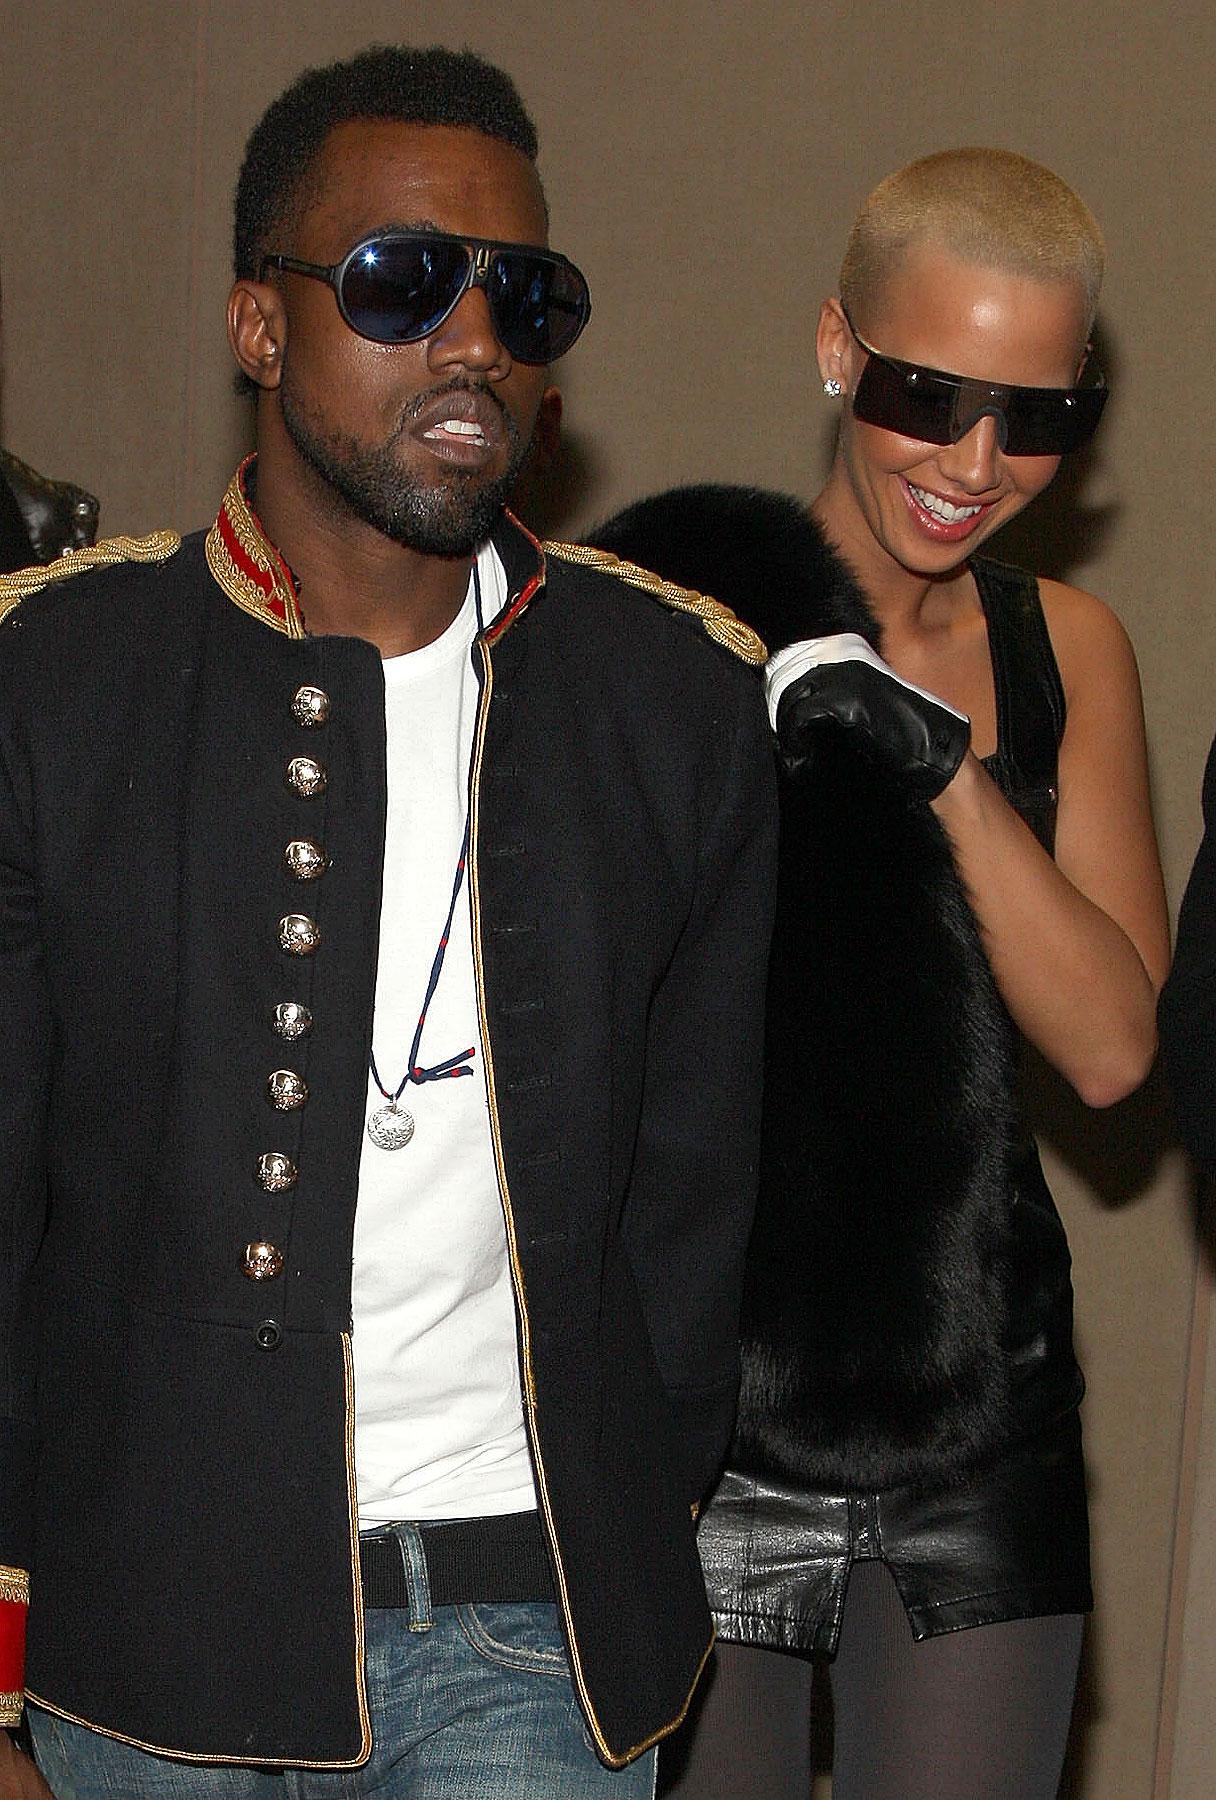 Has Kanye West Met His Match?